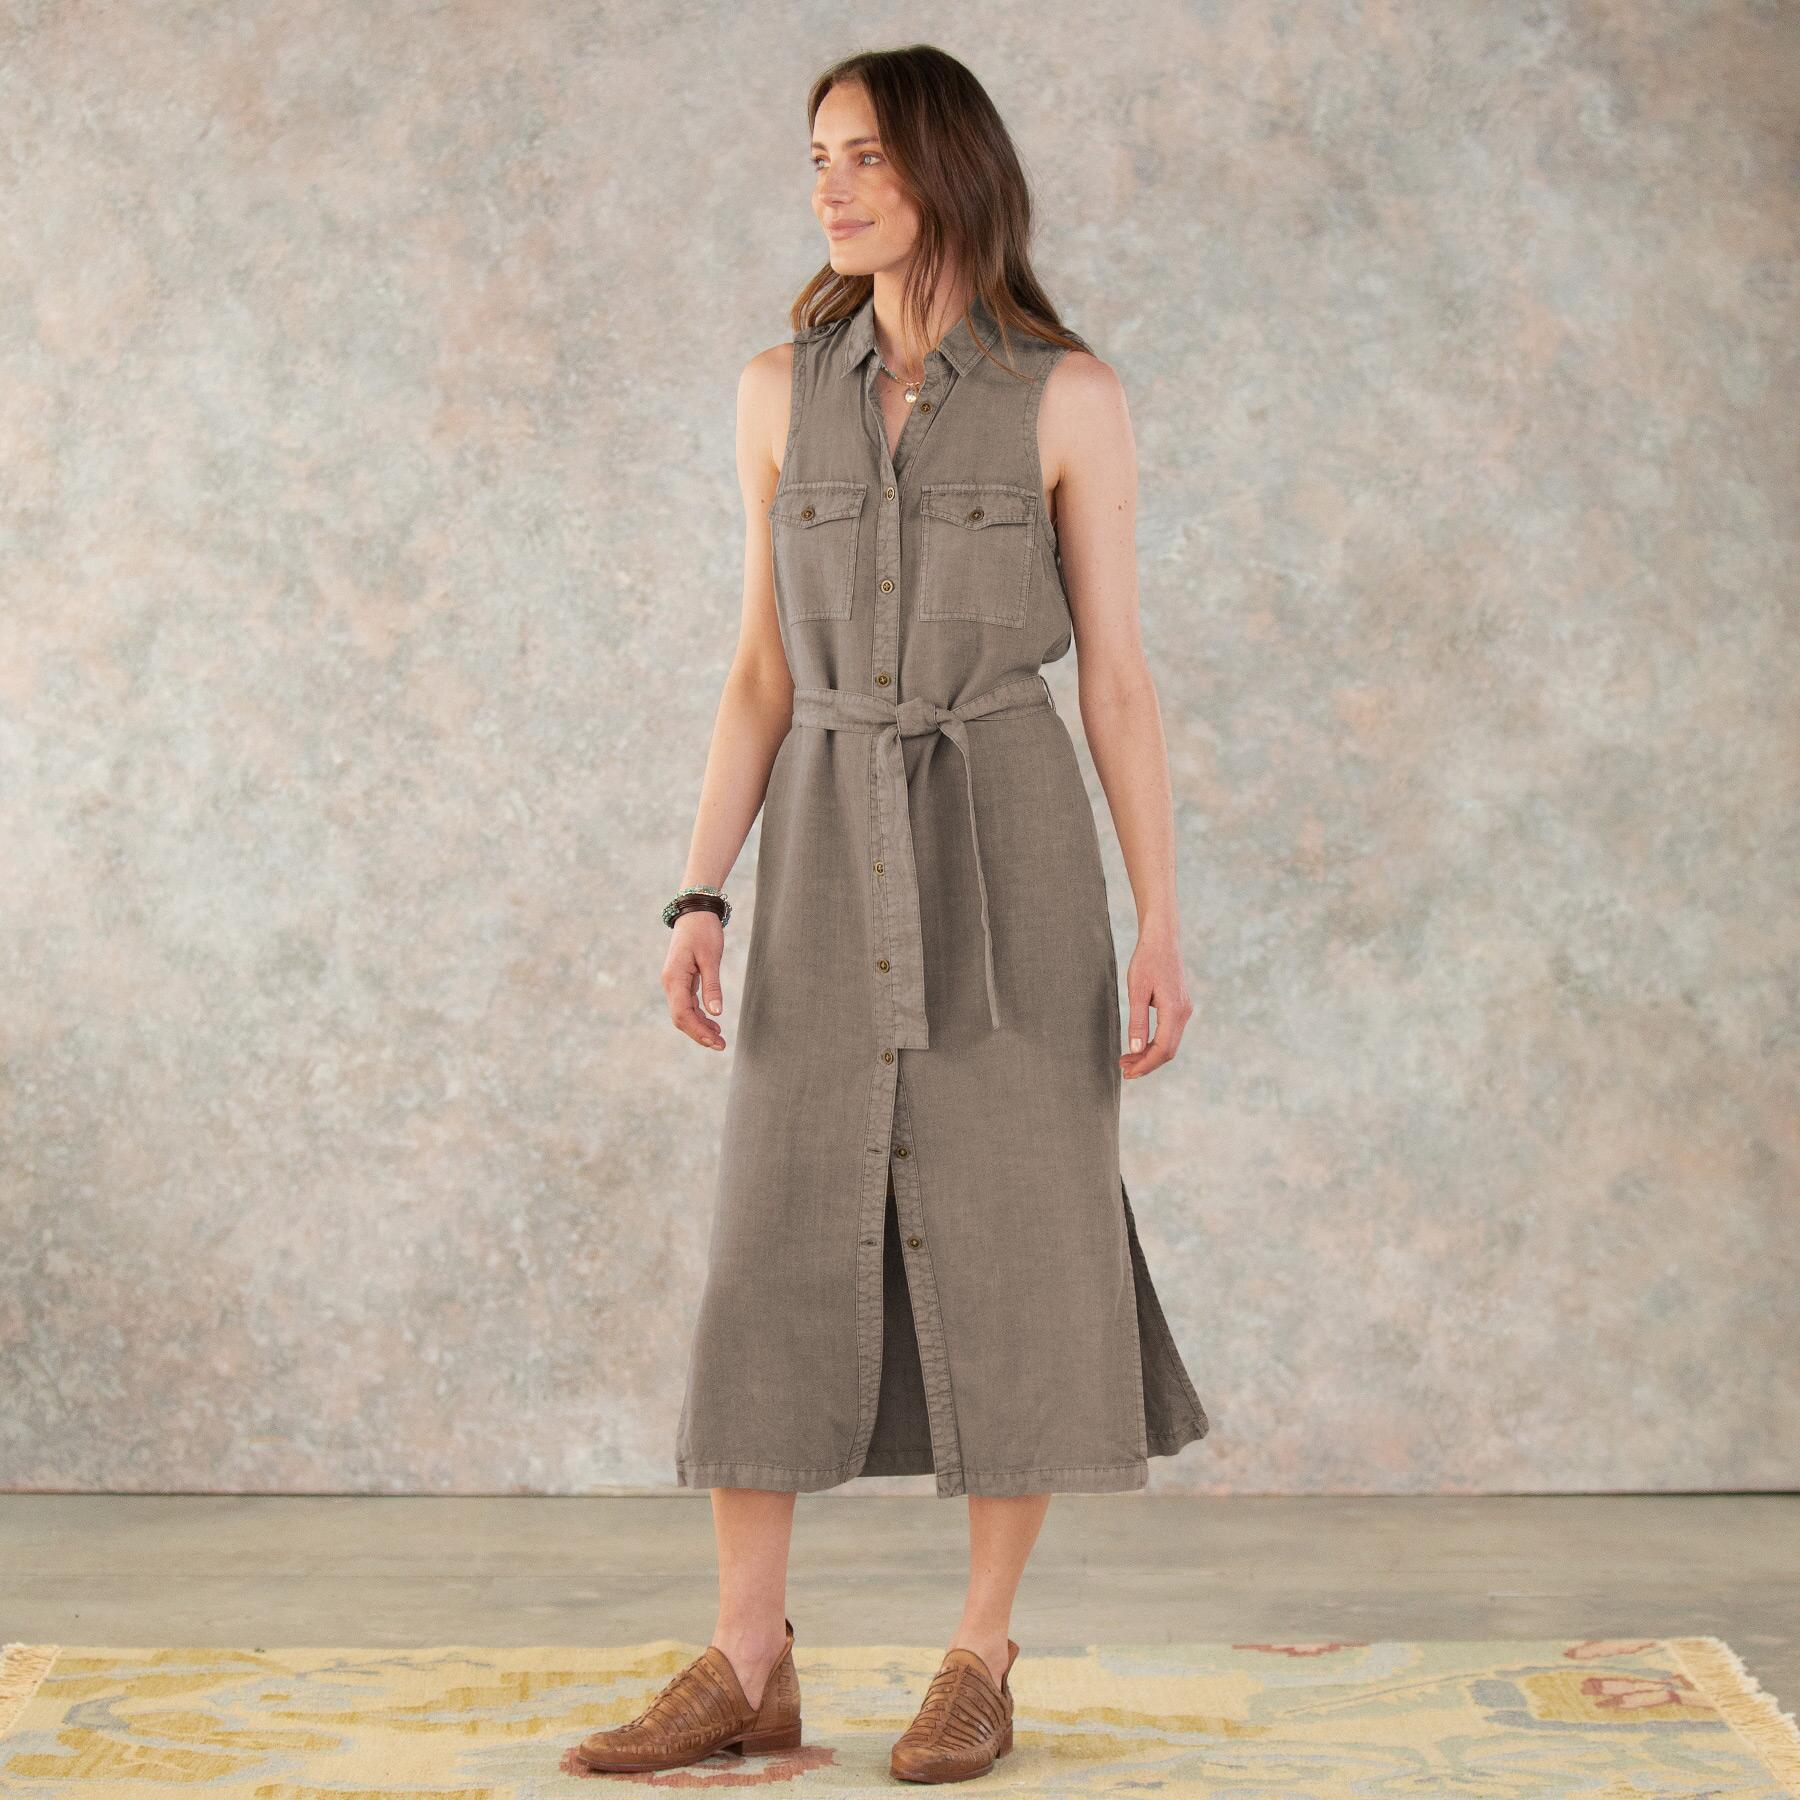 WESTWARD DRESS - PETITES: View 2